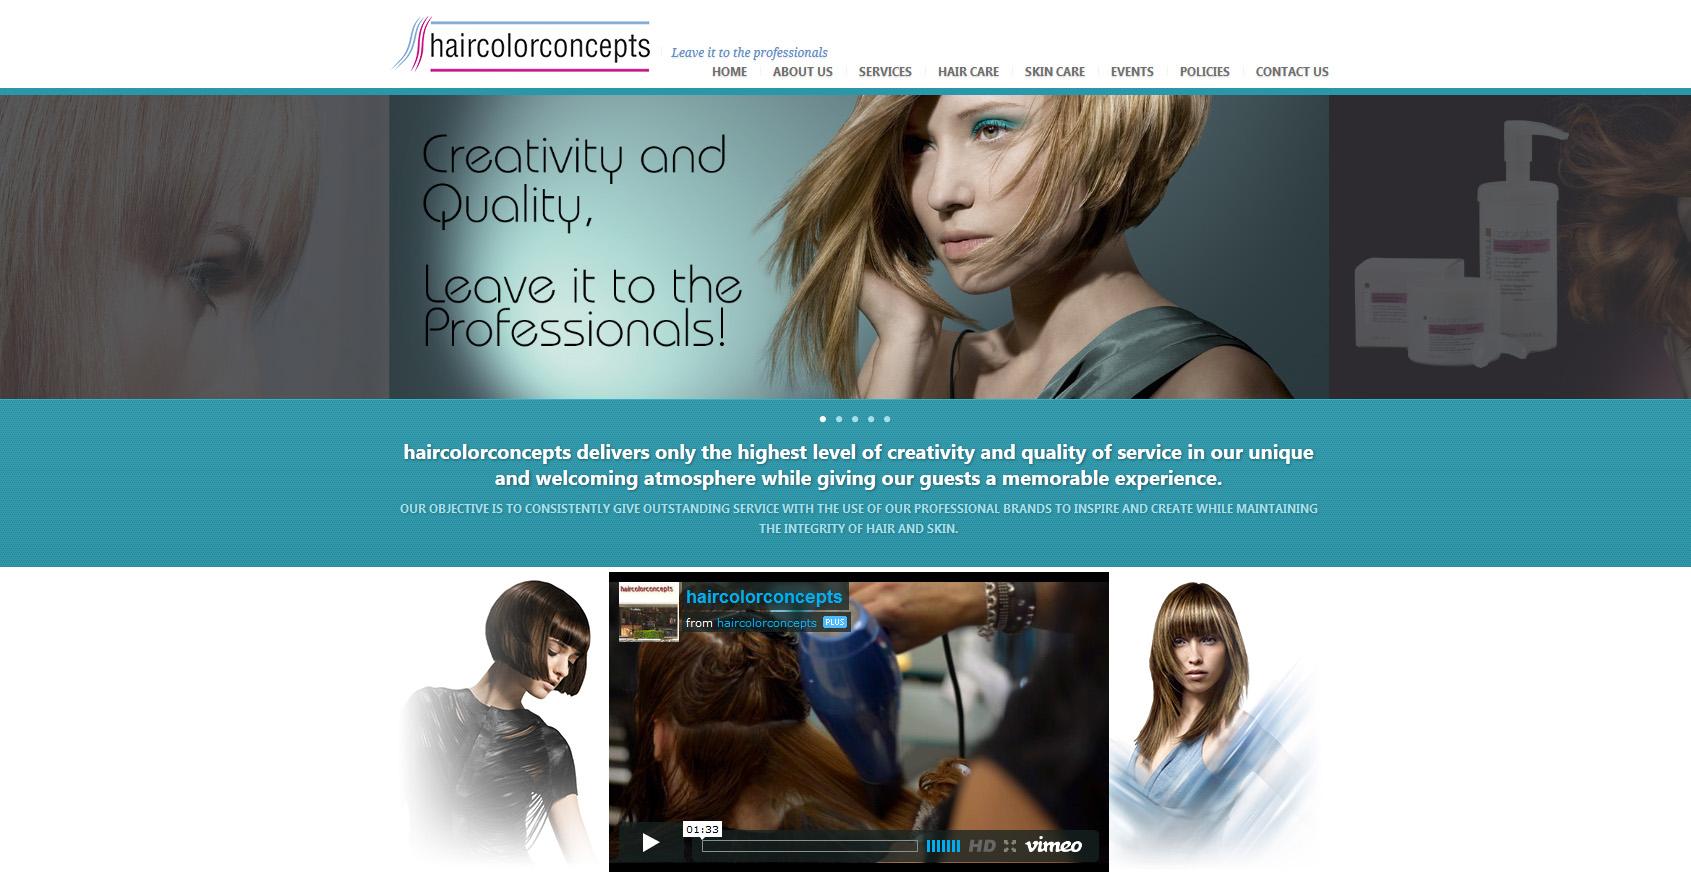 Haircolorconcepts Rare Pixel Design